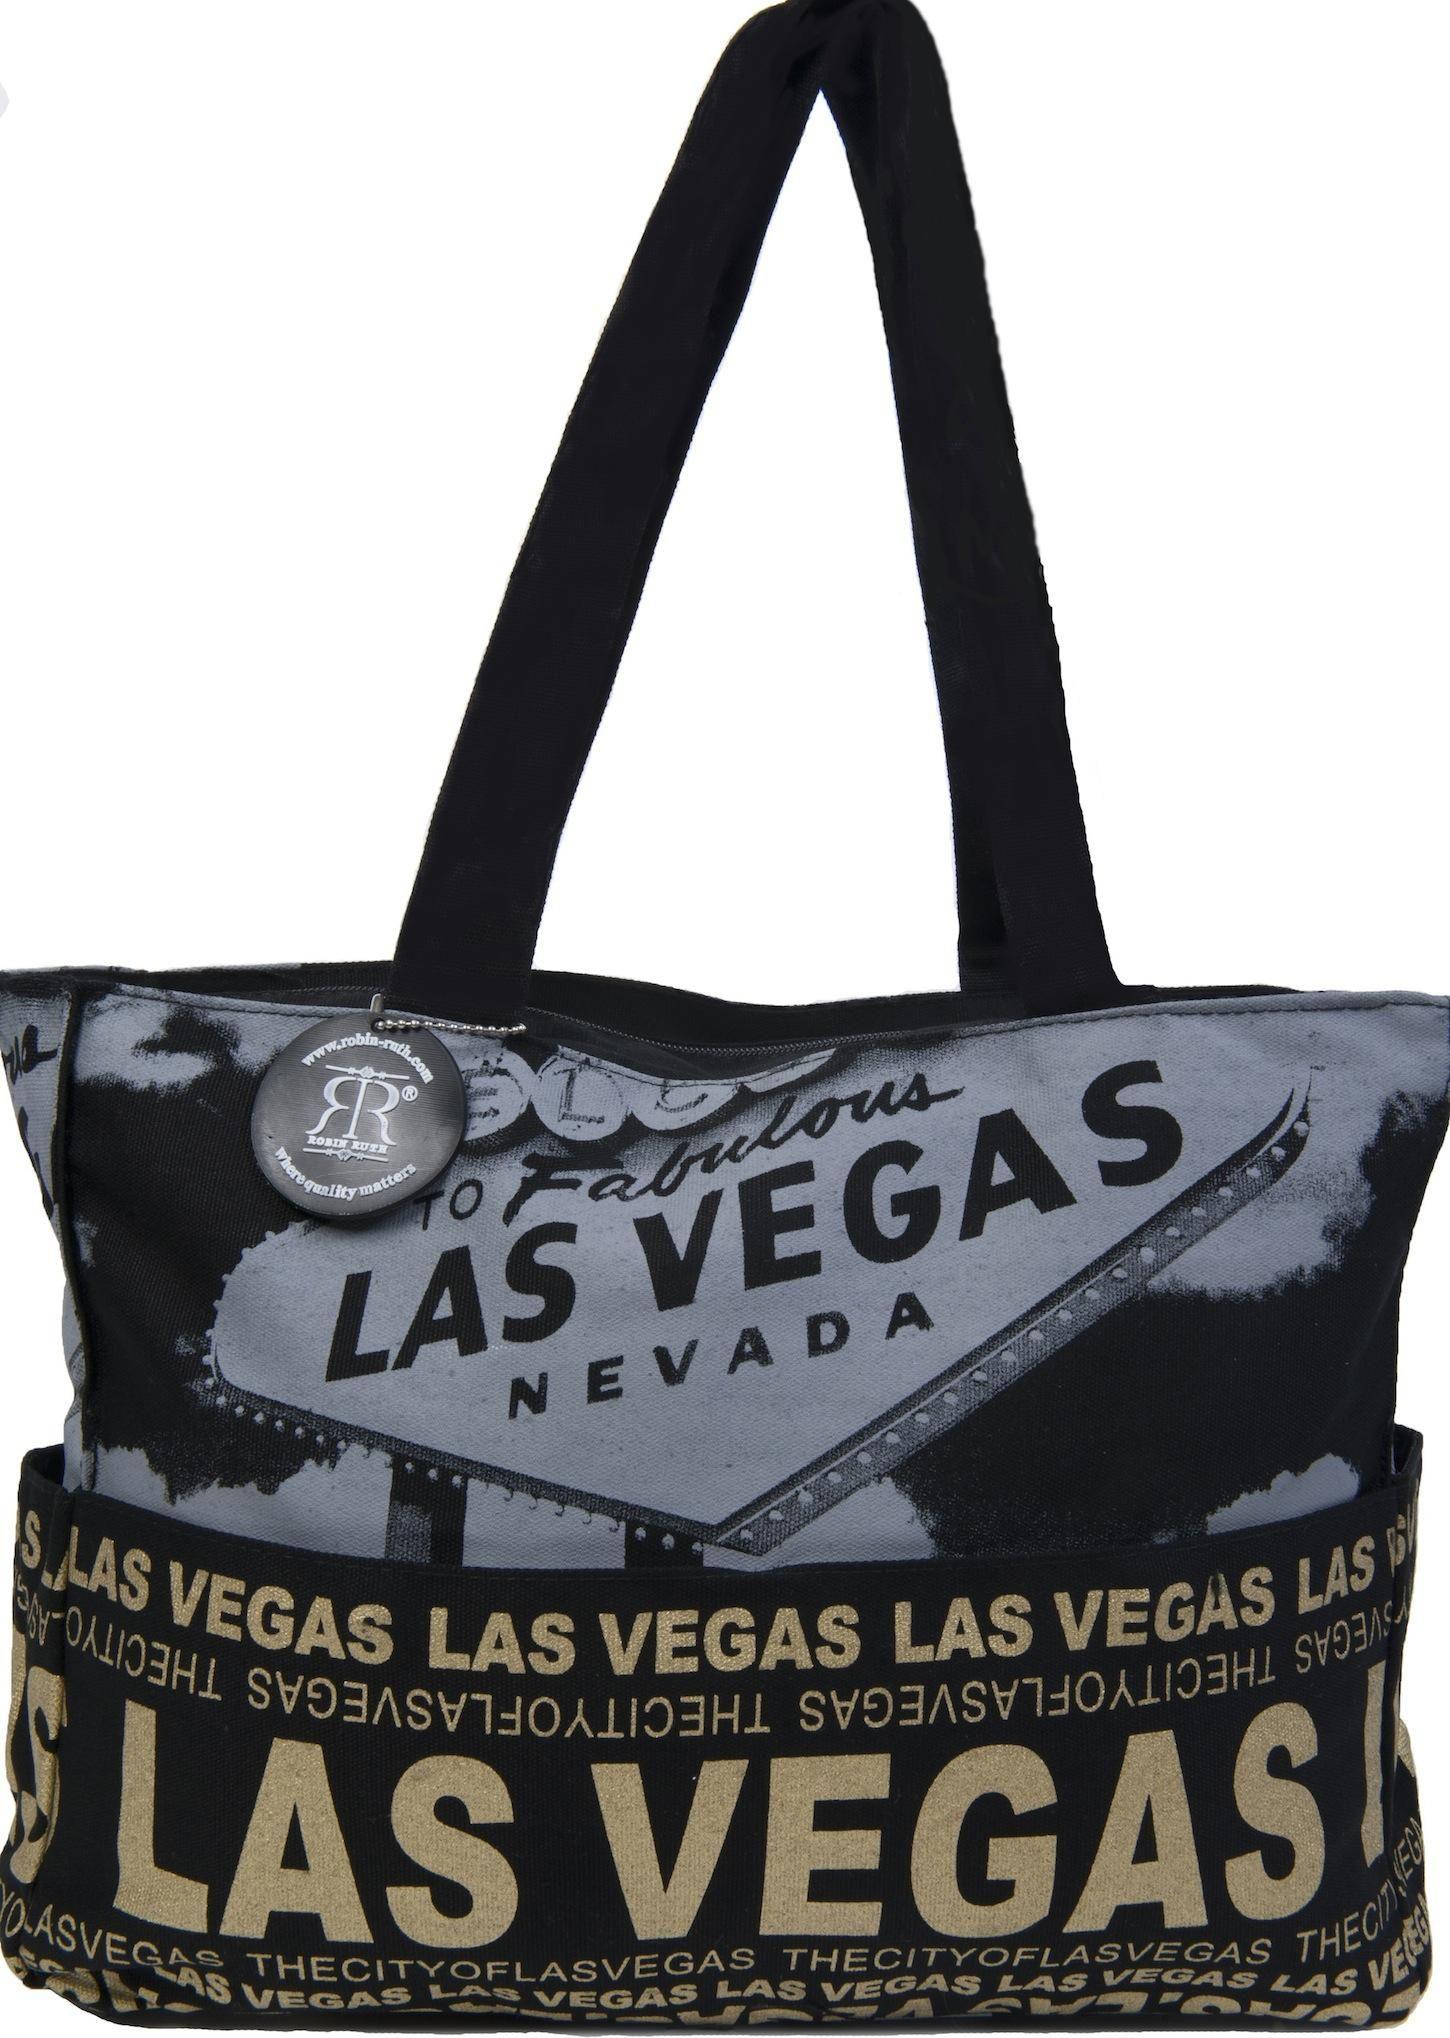 Souvenir Tote Bags Robin Ruth Las Vegas Bag Black Canvas